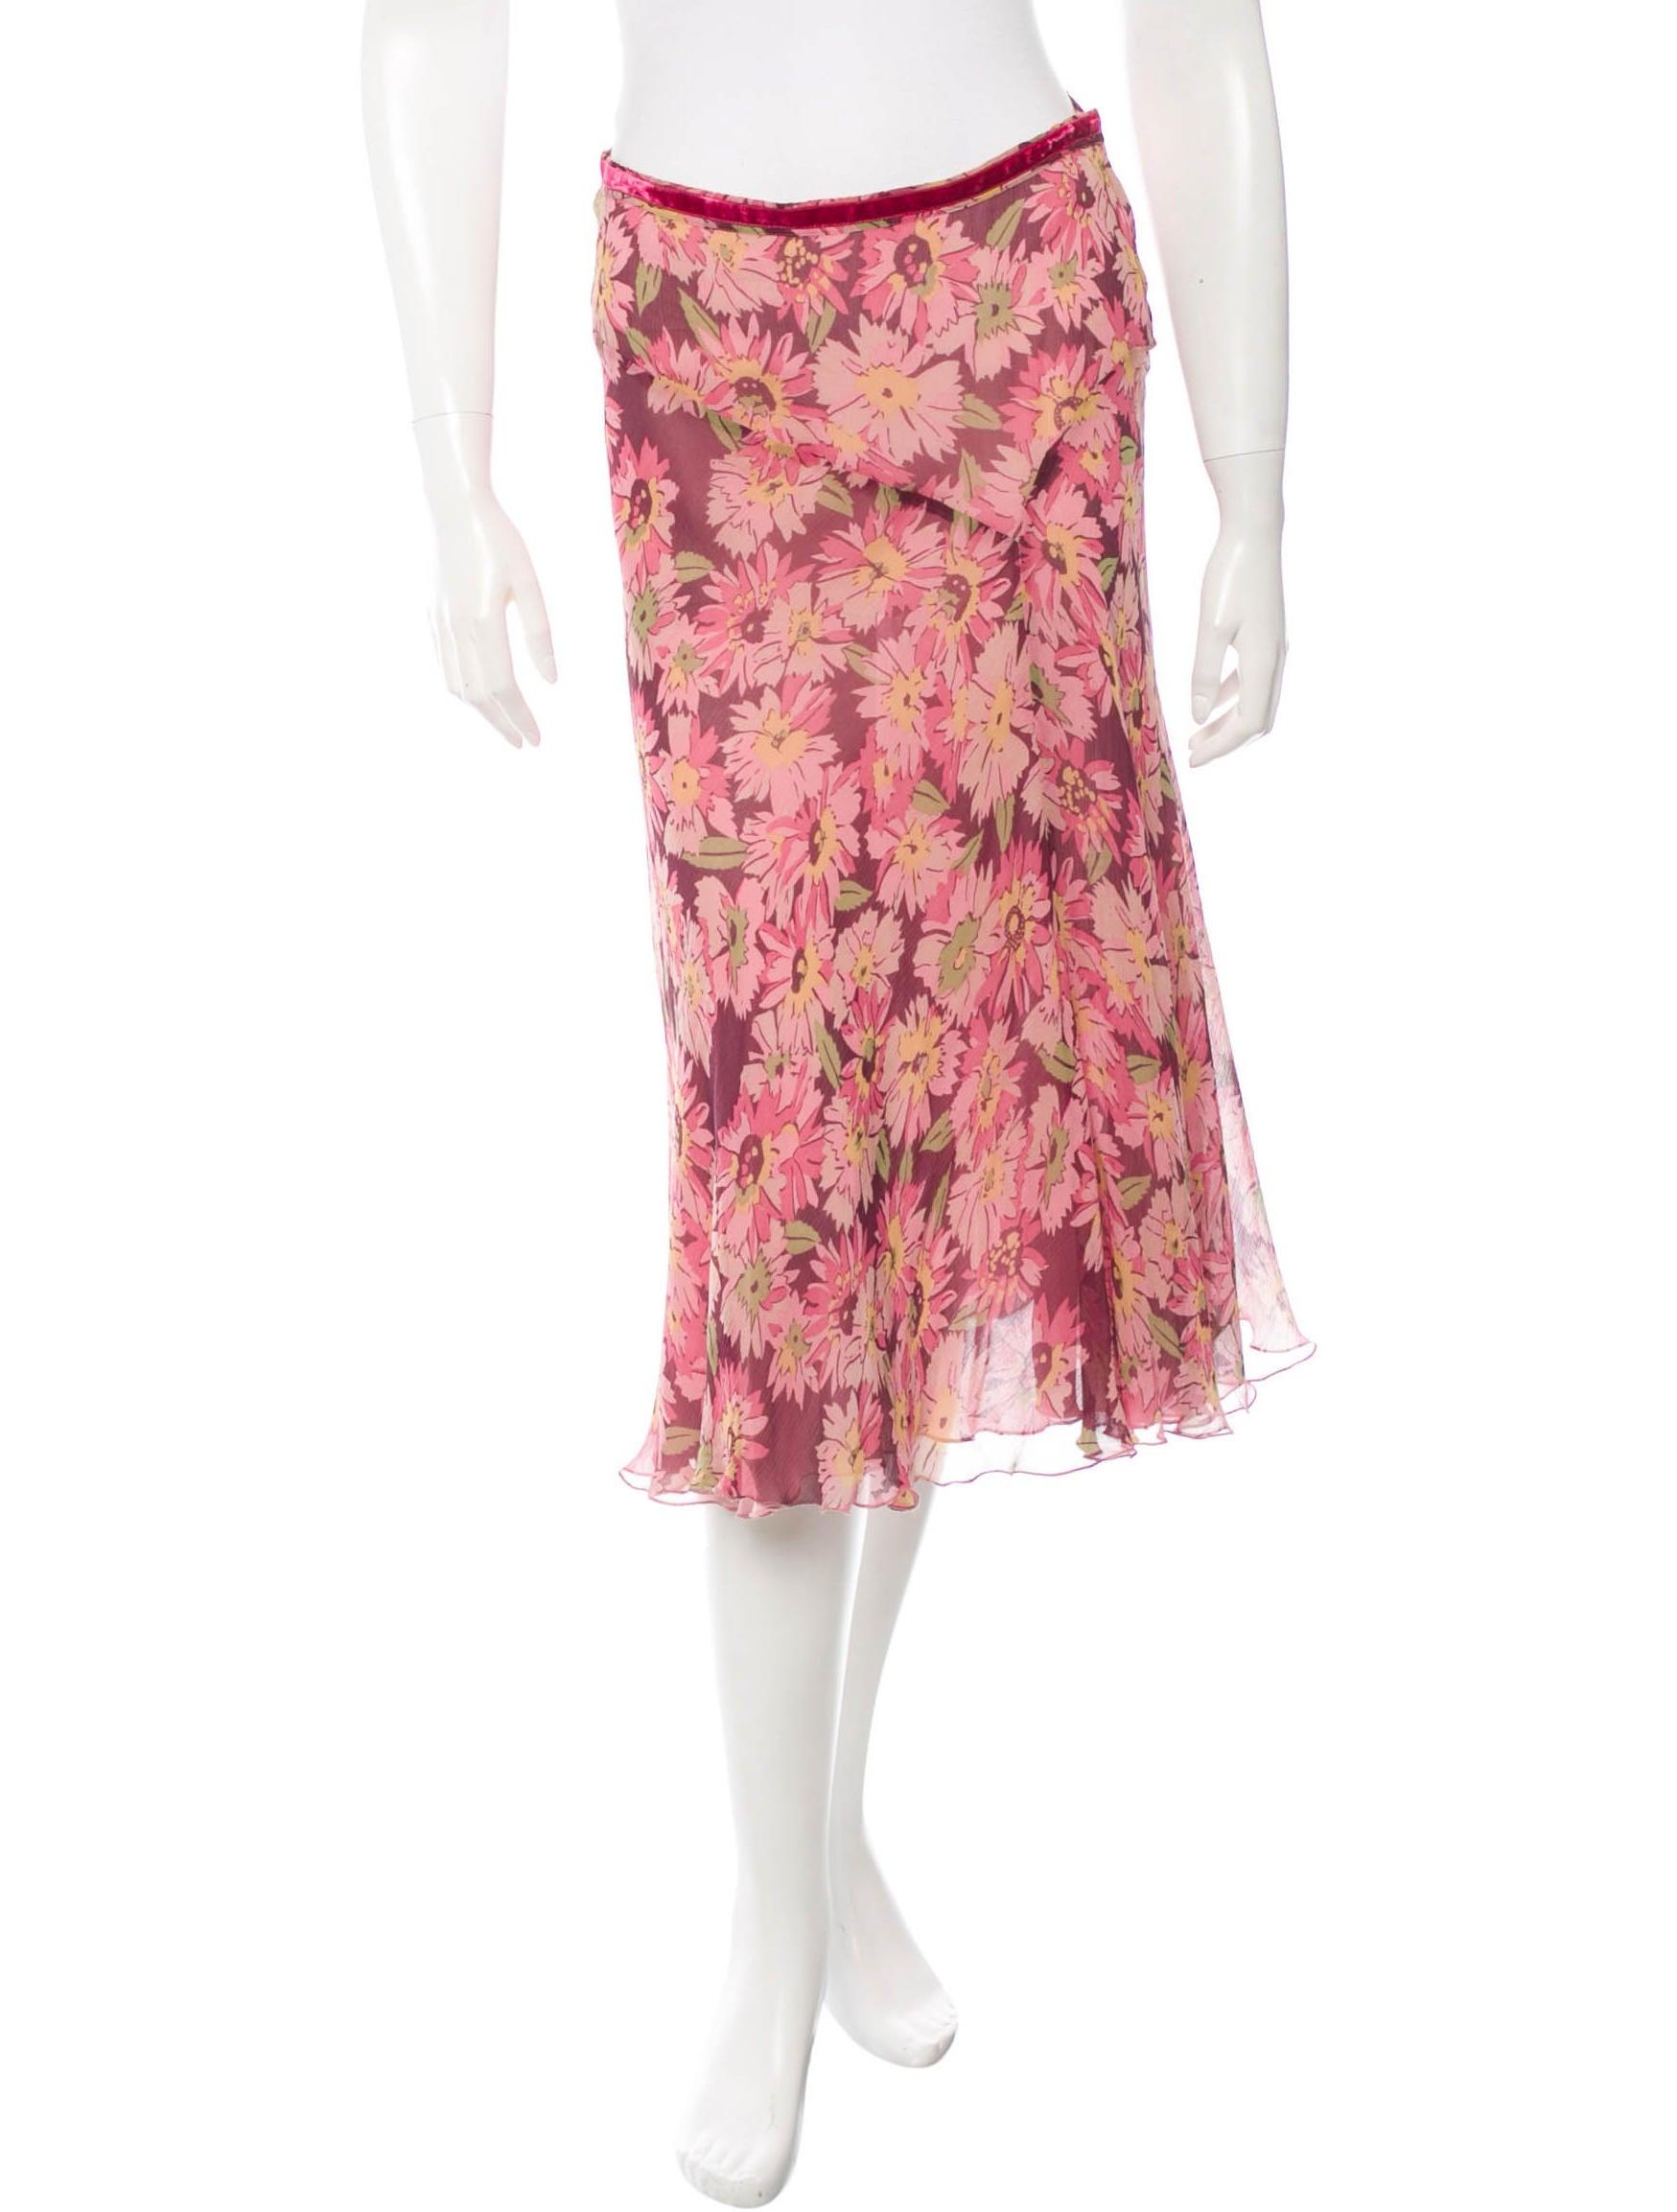 Blumarine Silk A-Line Skirt - Clothing